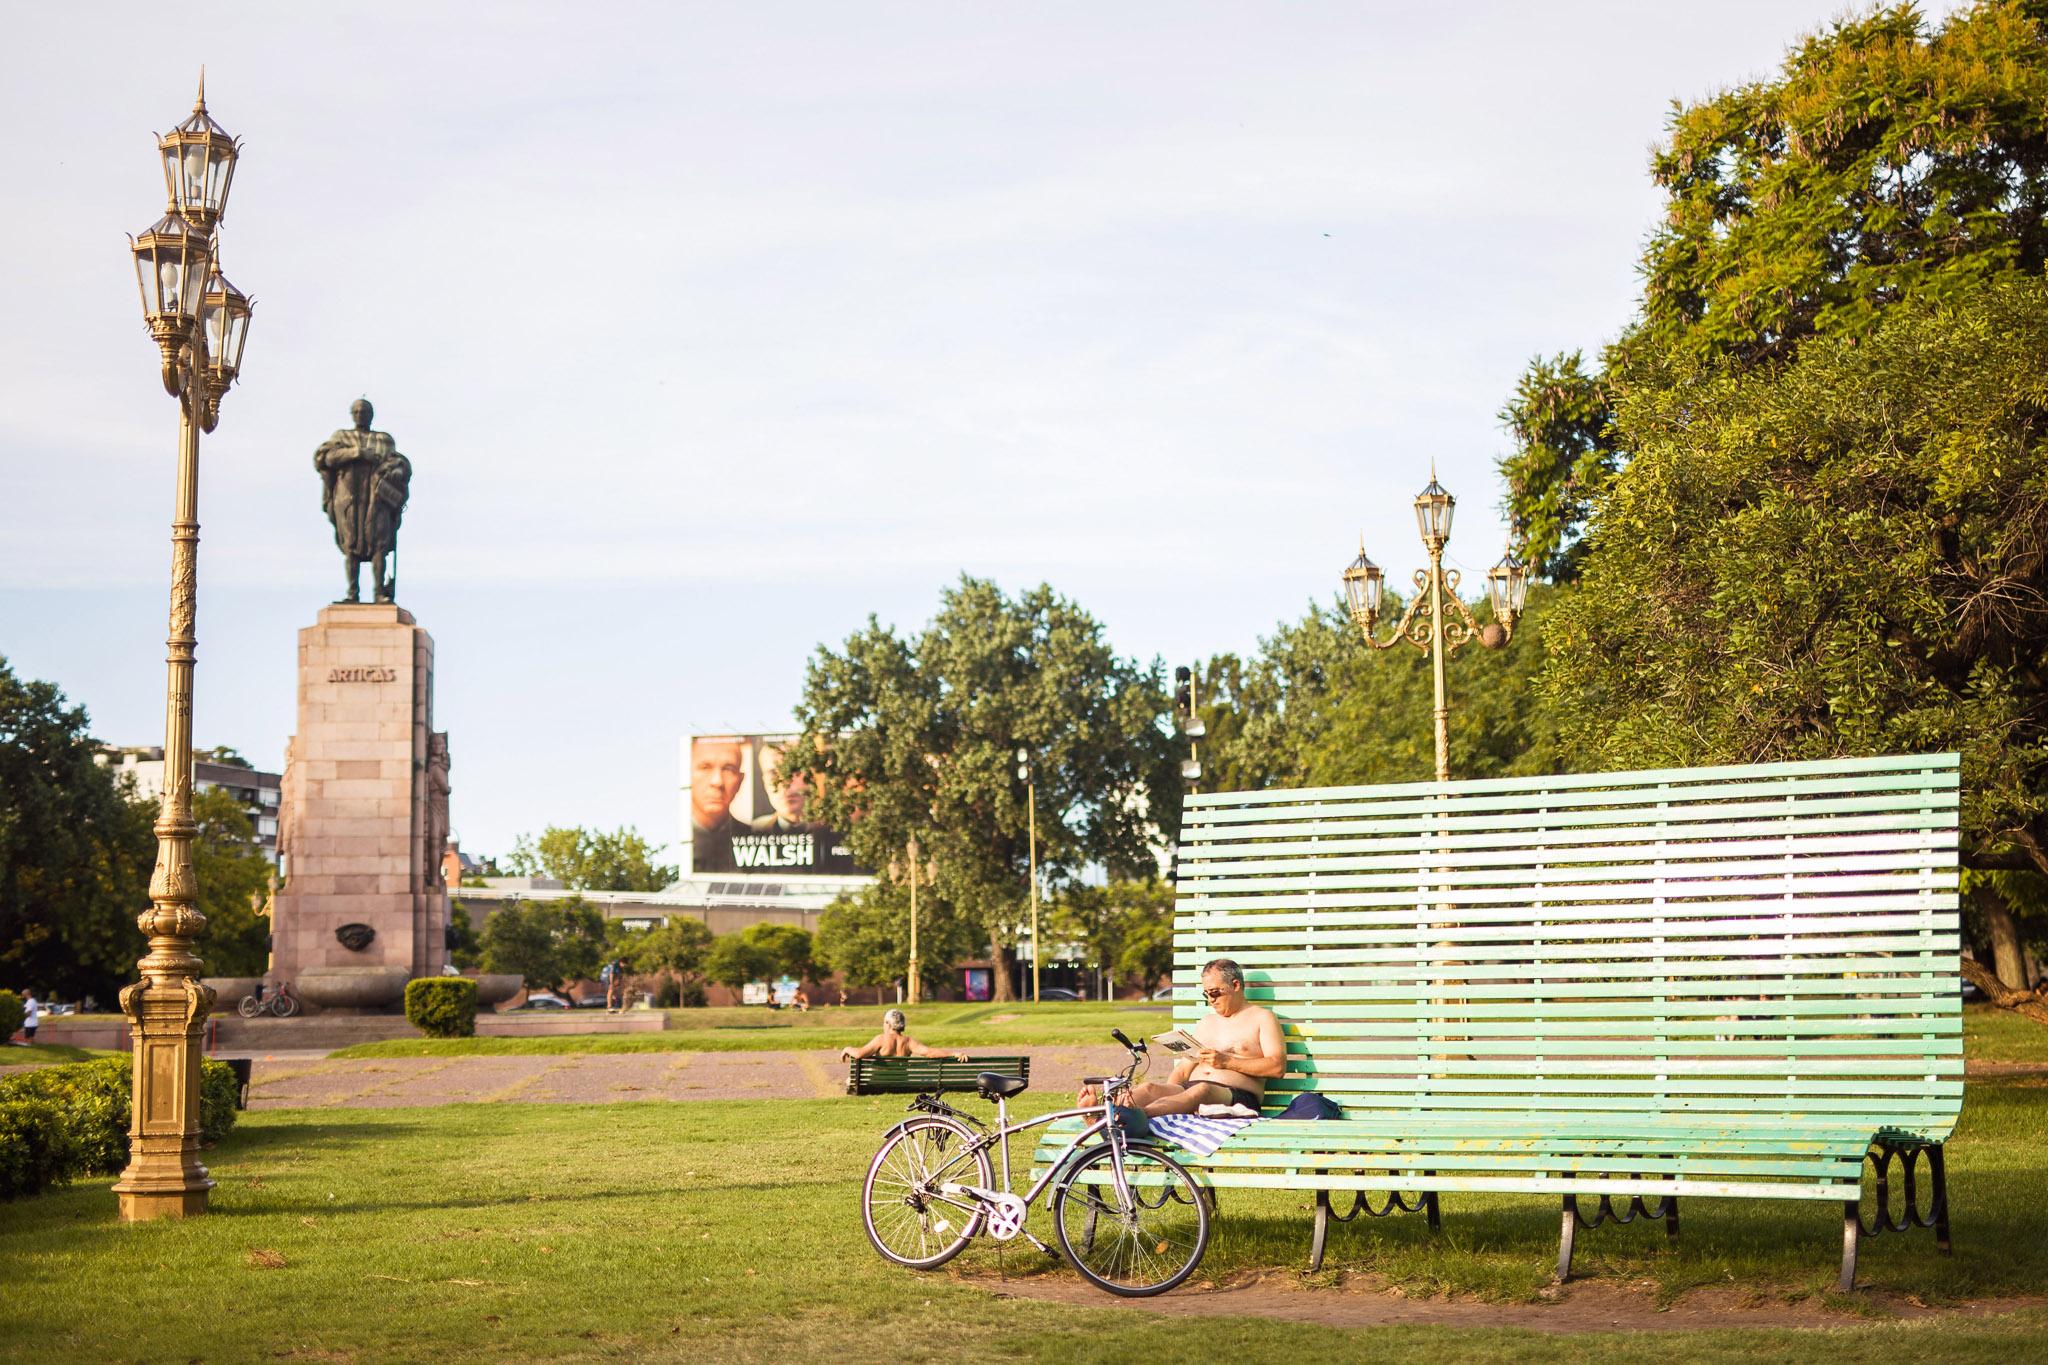 Wedding-travellers-Argentina-Buenos-Aires-Palermo-park-big-bench